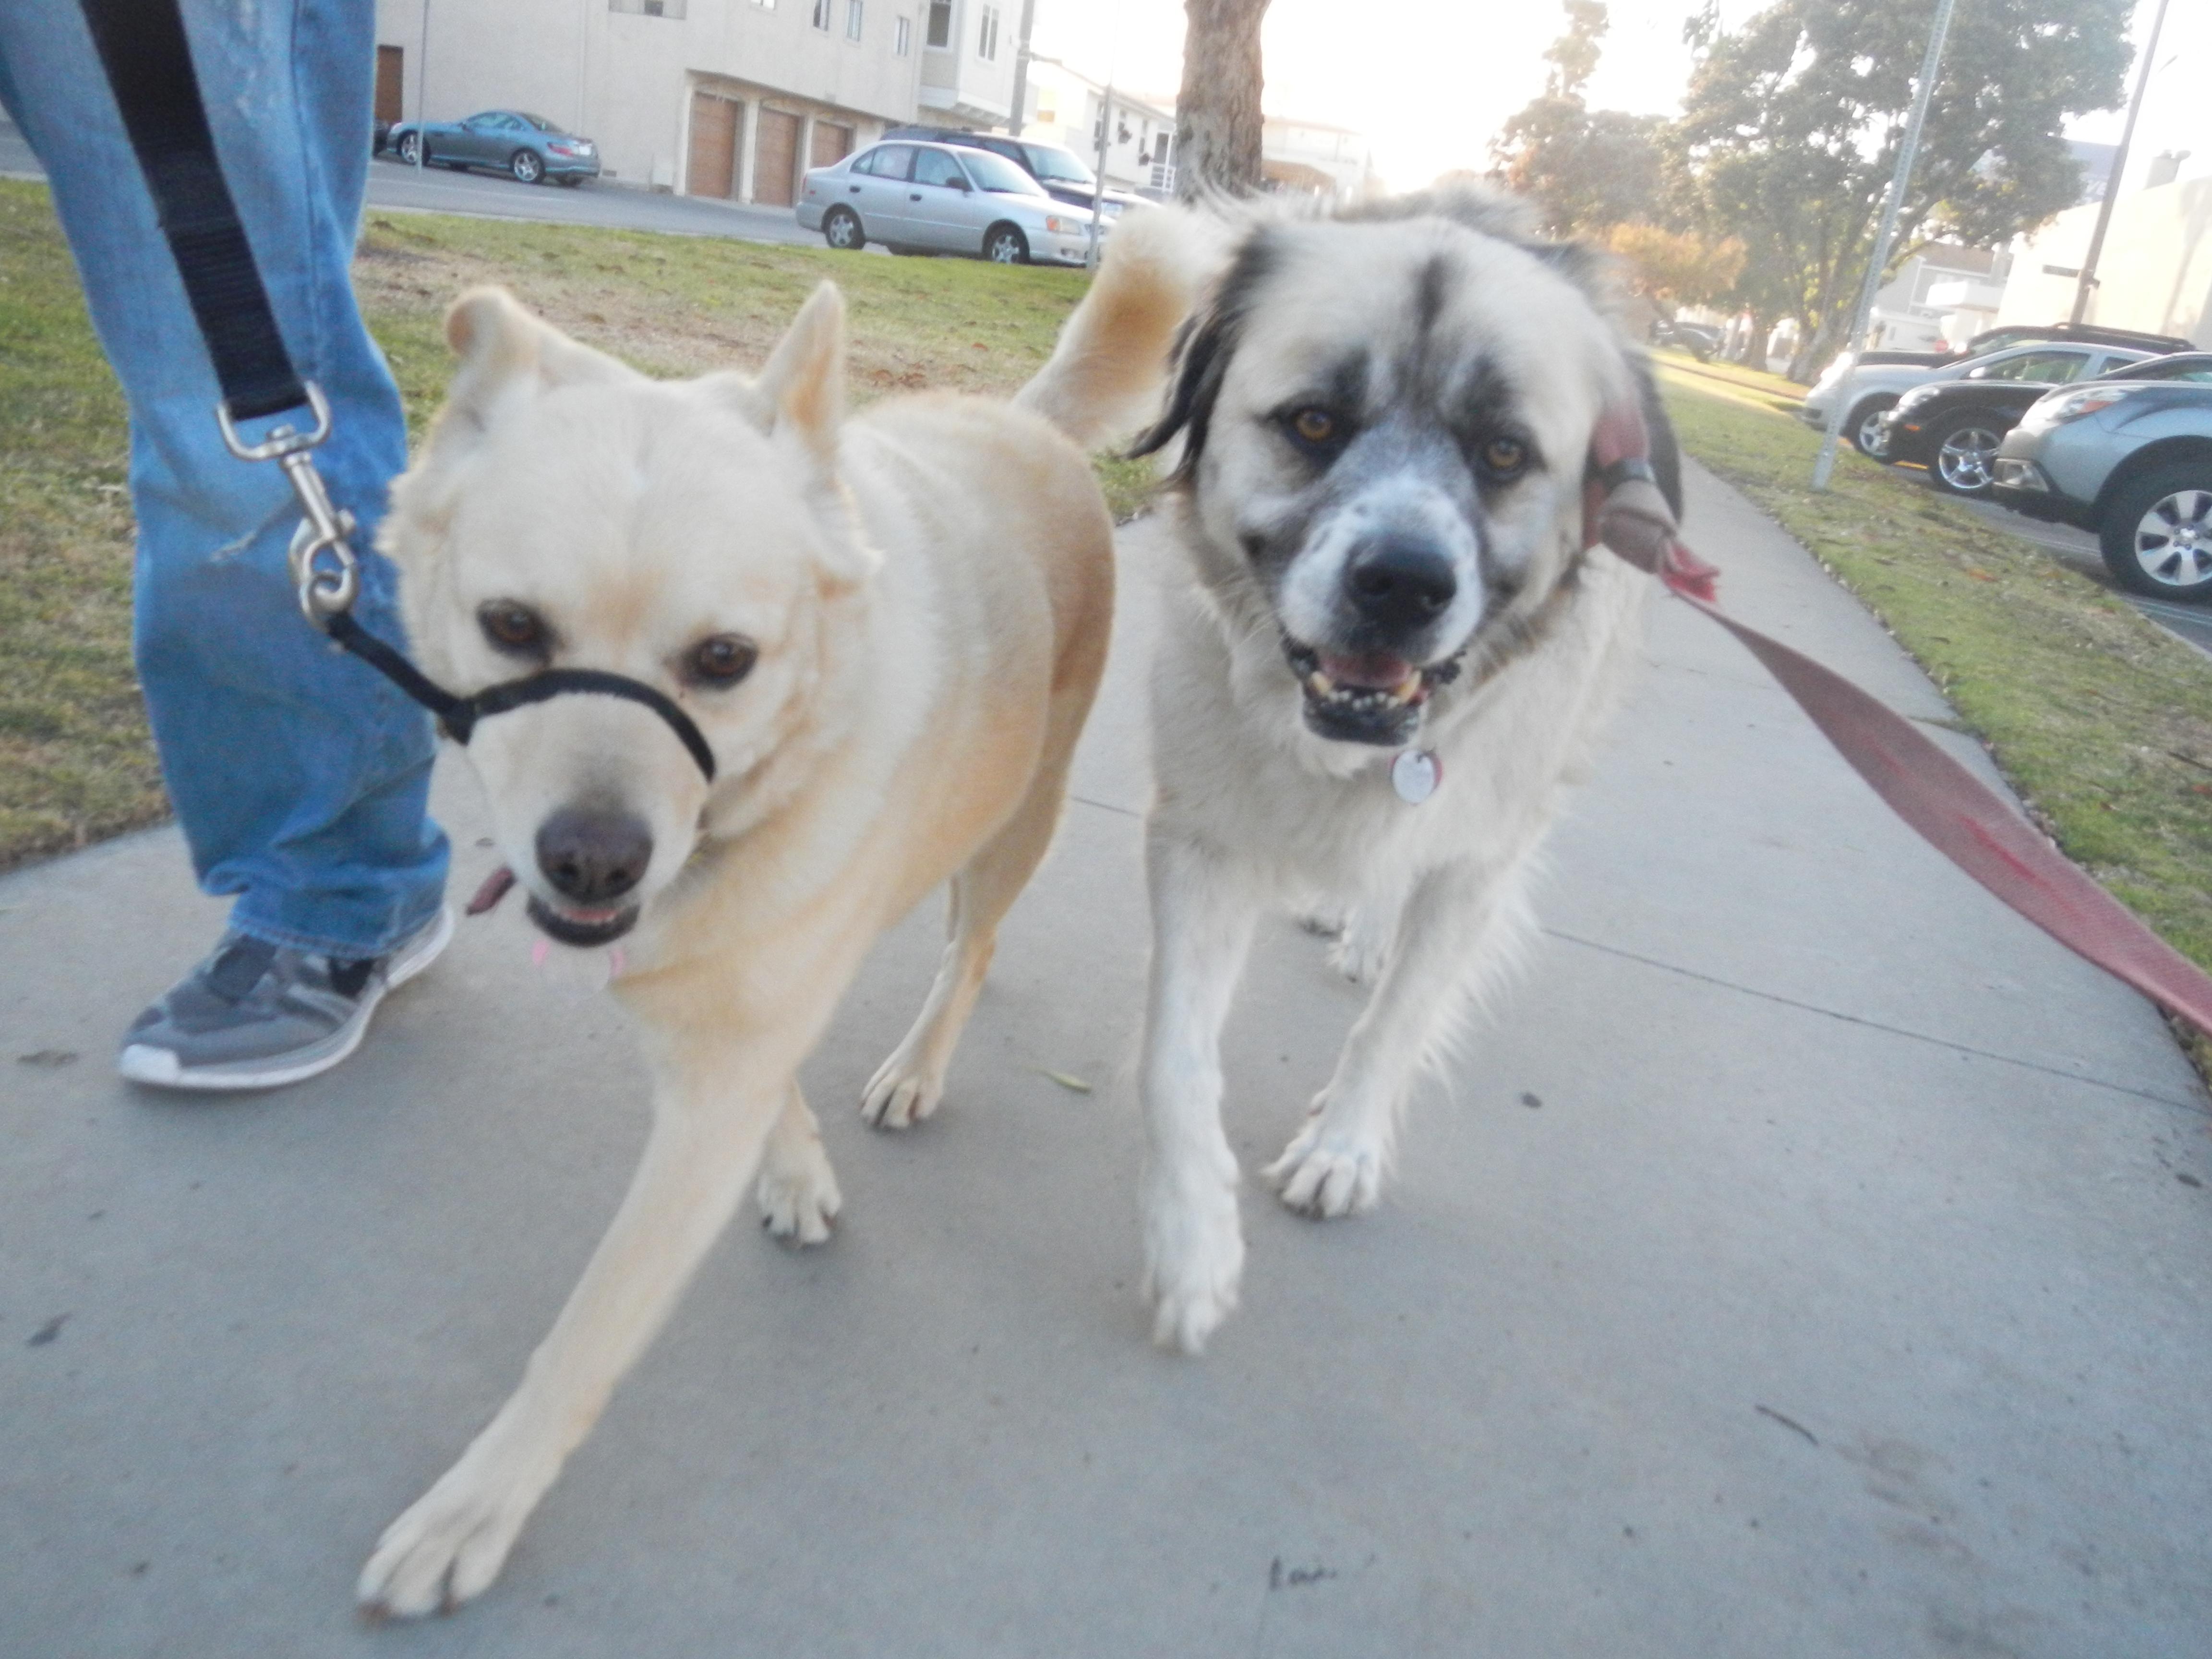 Goldie and Herman